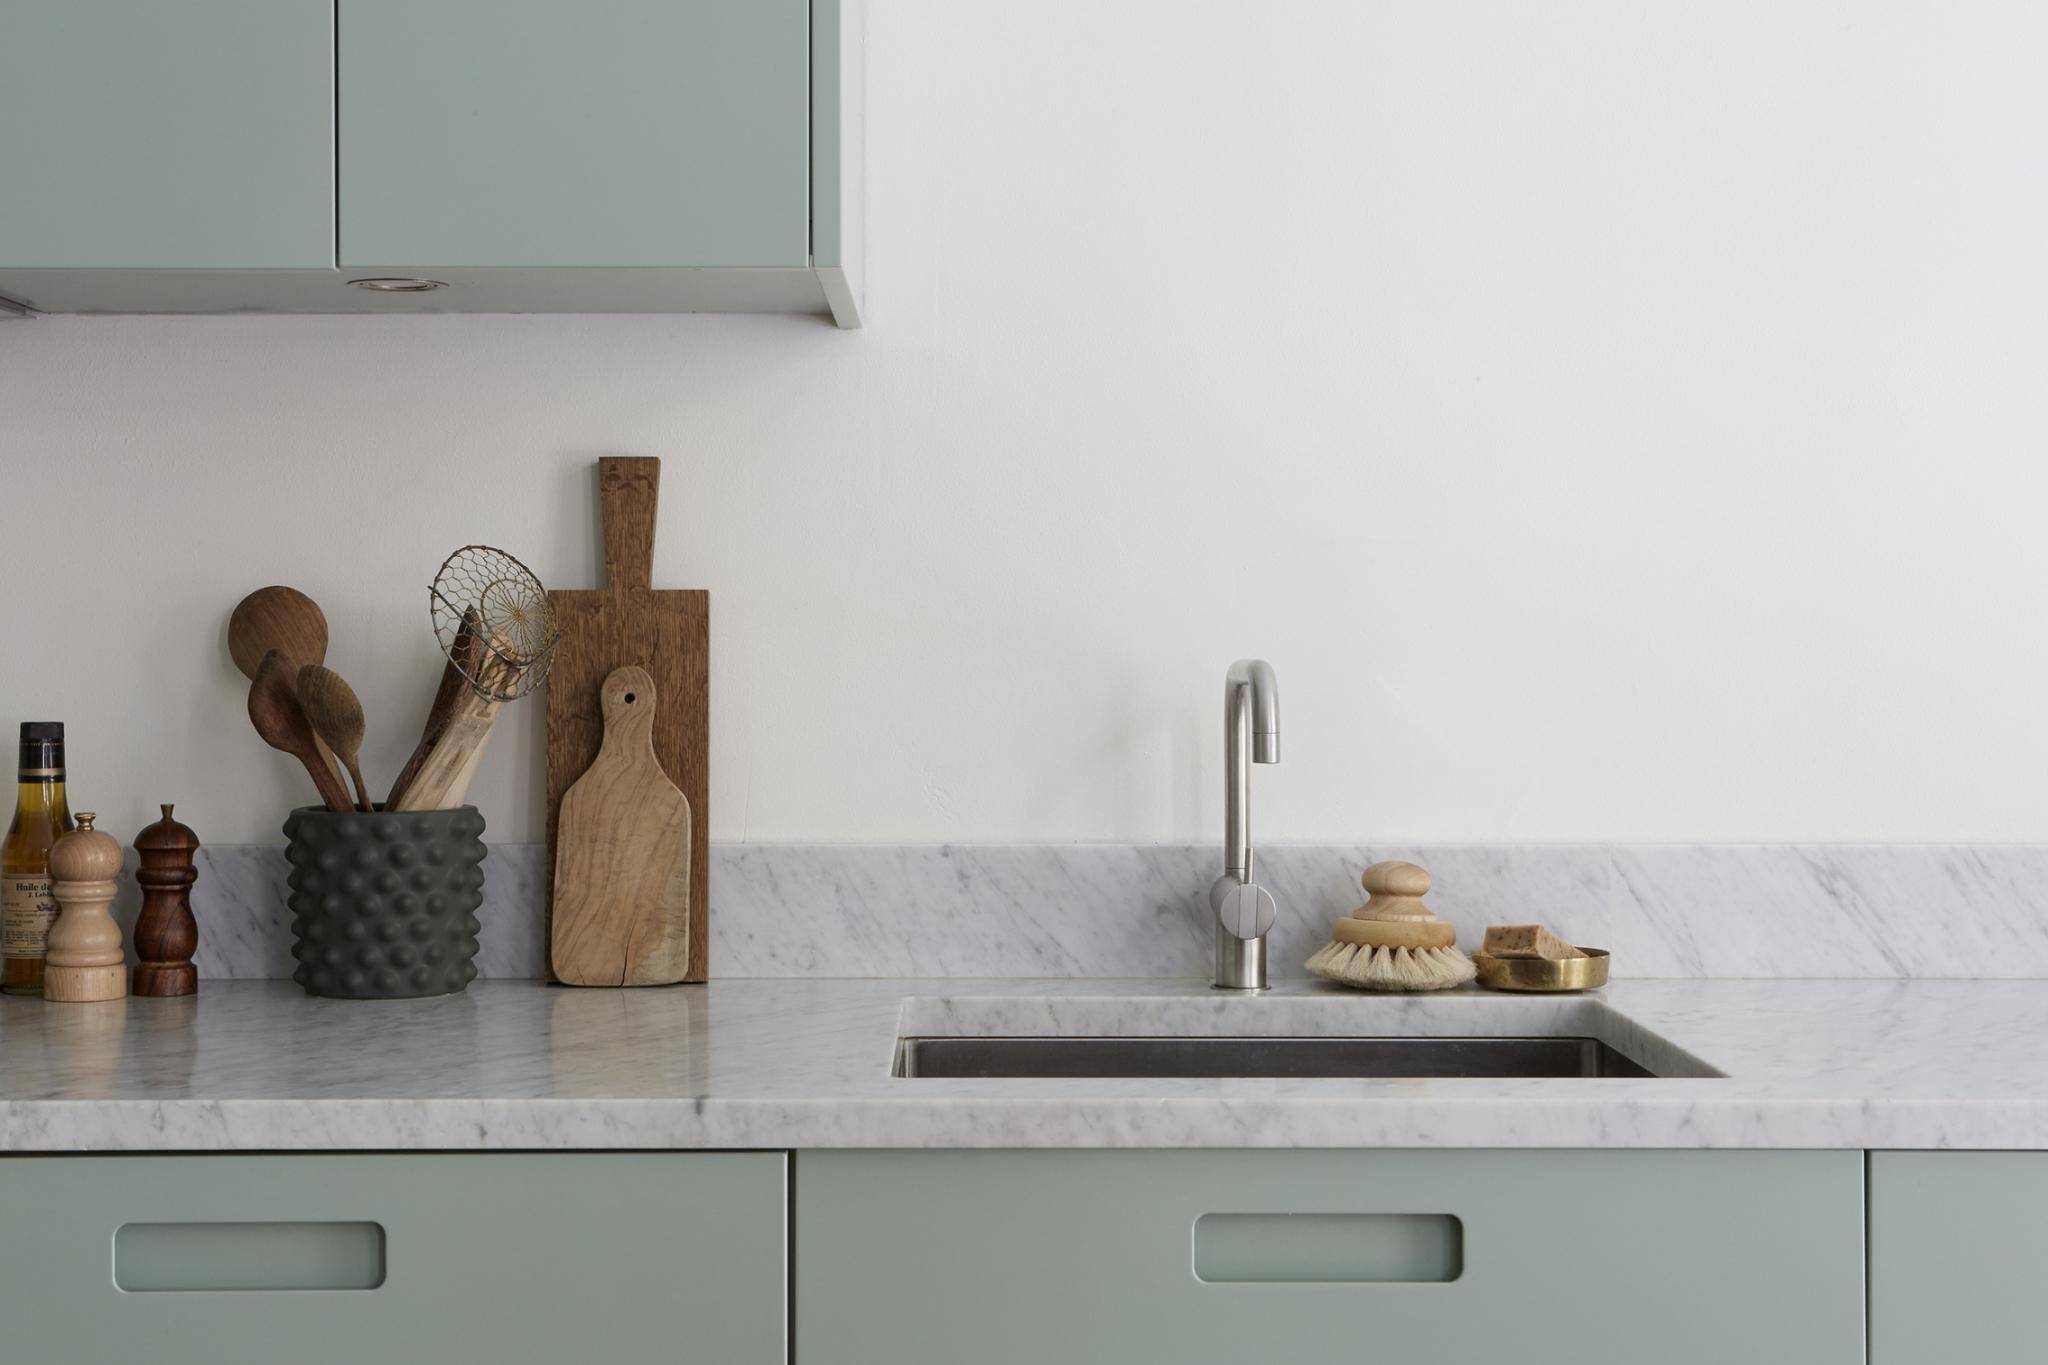 Moderne keuken accessoires wandspots keuken houtlook blad